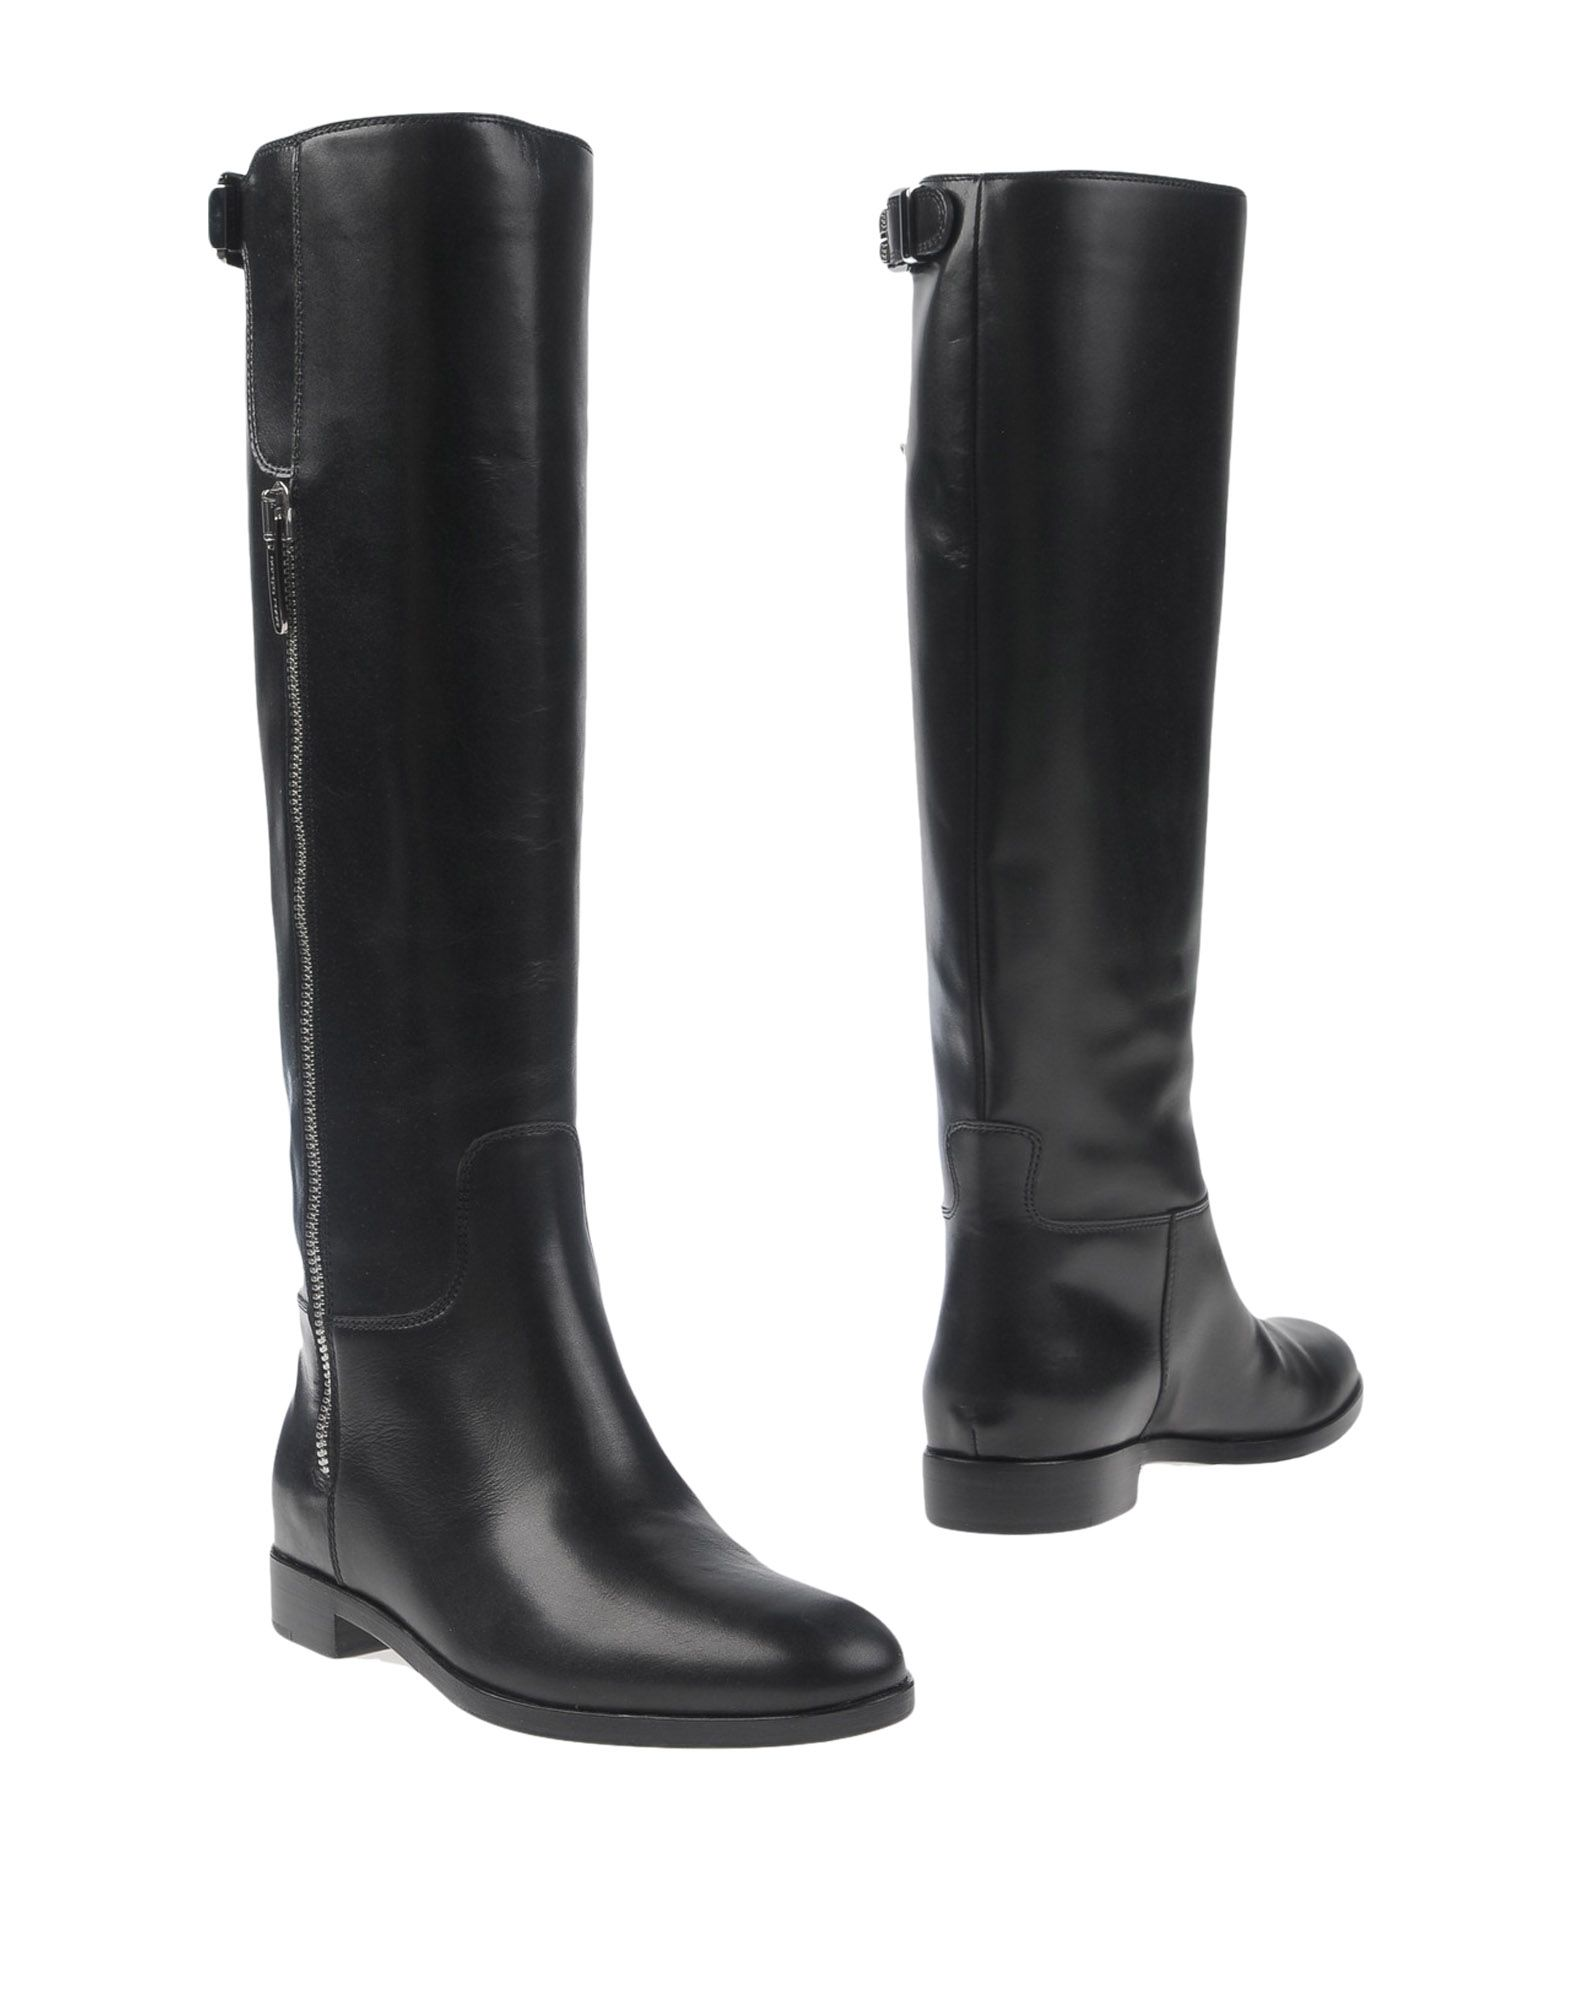 sergio rossi bottes - bottes femmes sergio rossi bottes - en ligne sur canada 500dcf